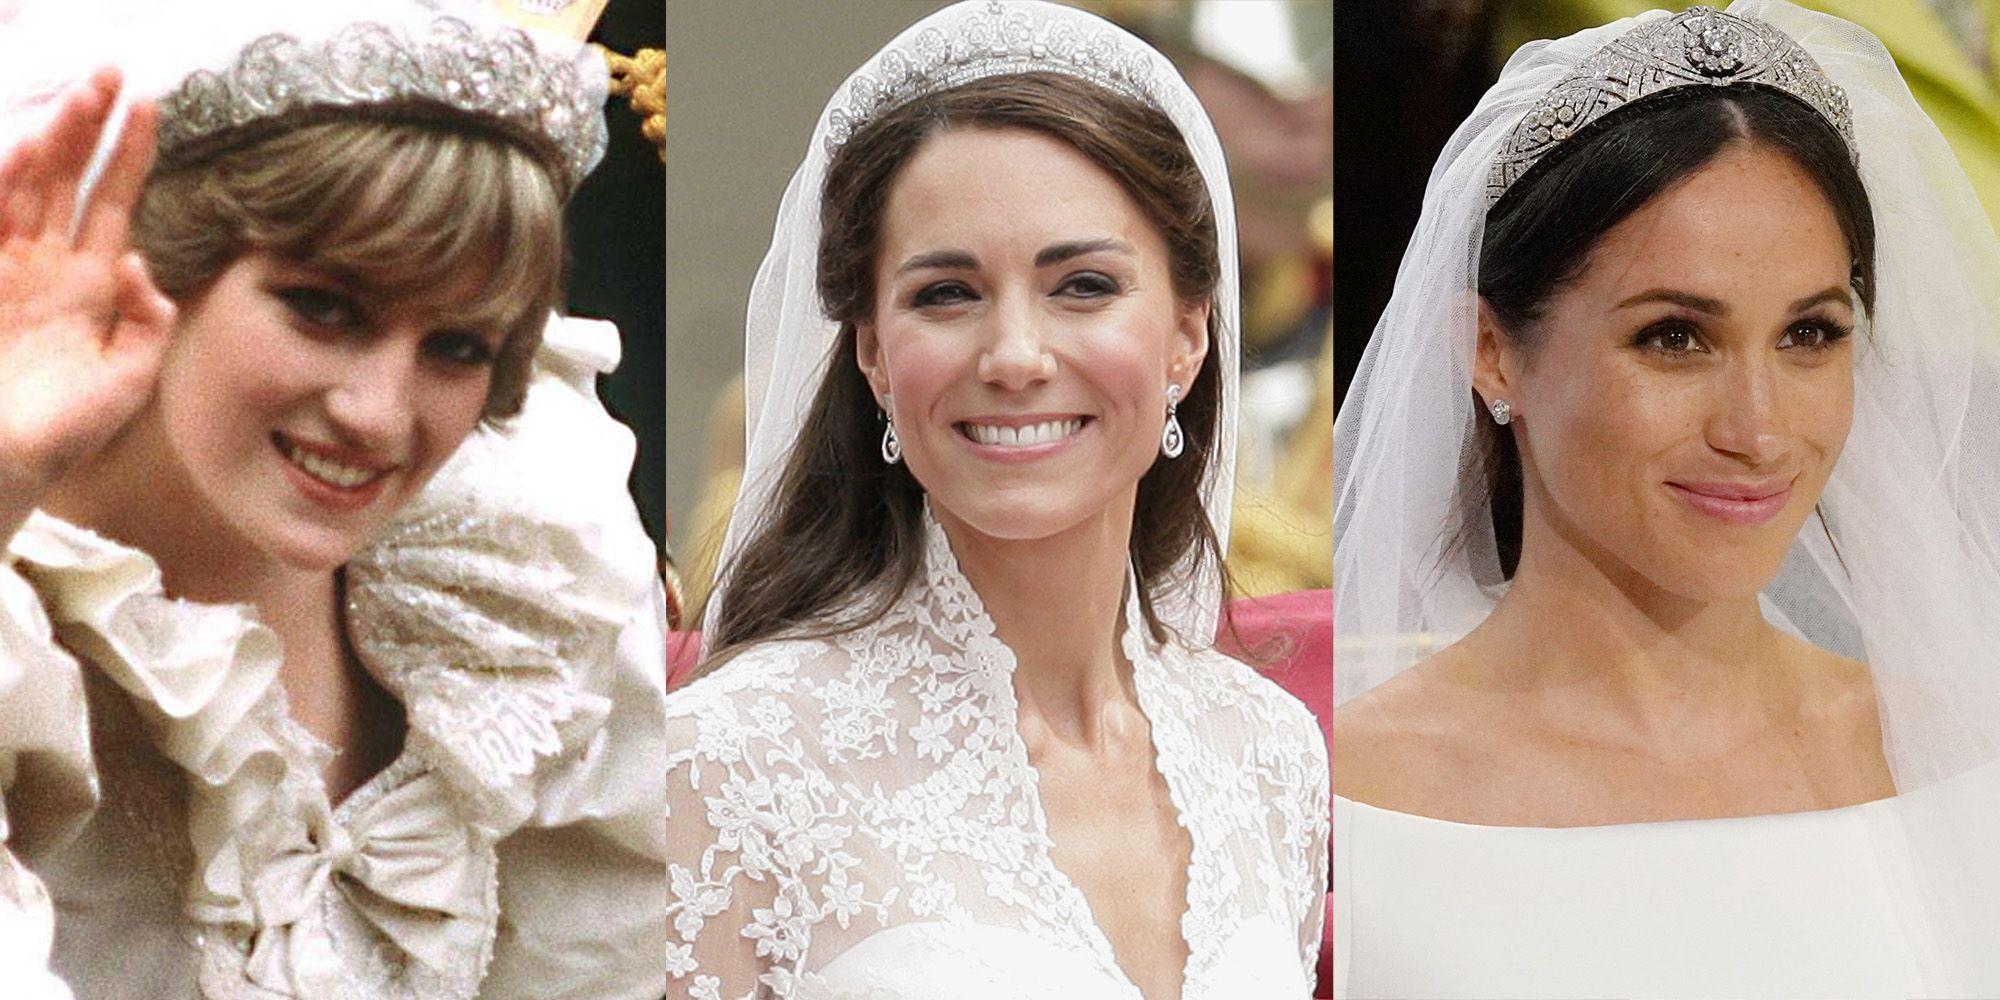 Meghan Markle Kate Middleton Princess Diana Royal Wedding Comparison